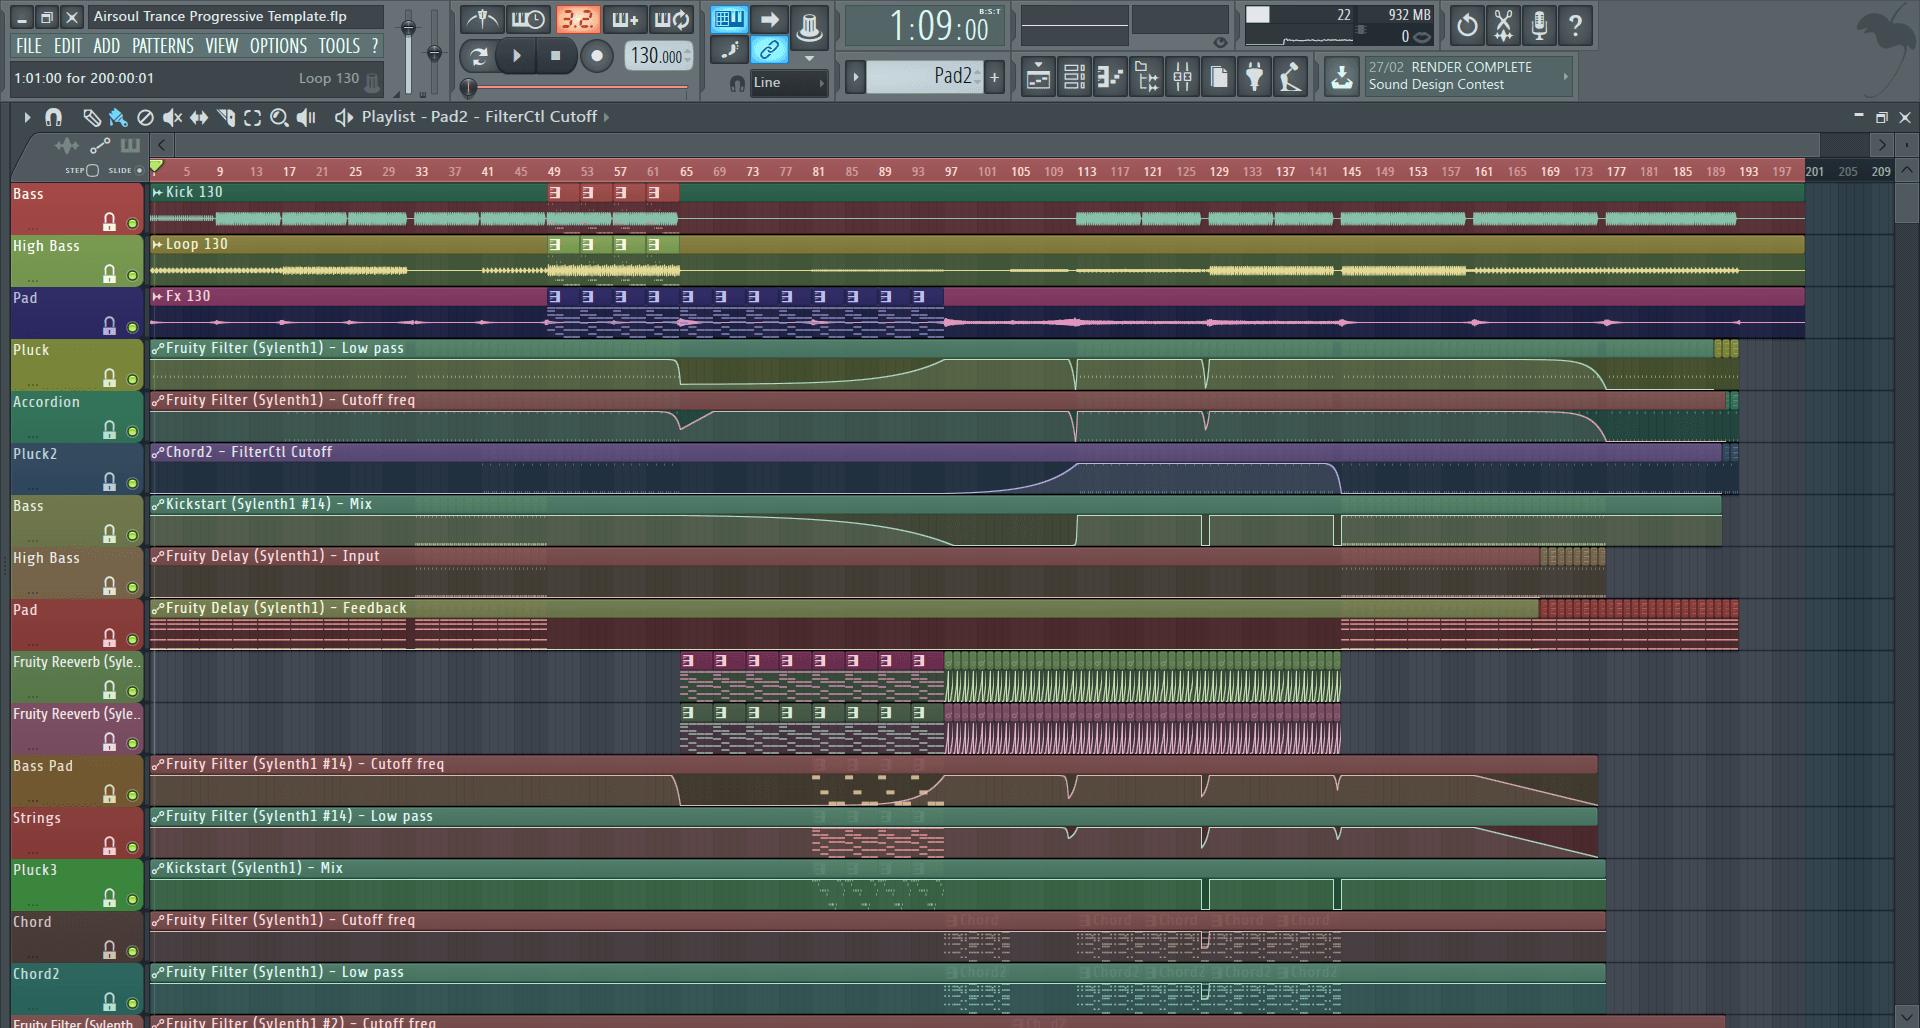 Airsoul-Progressive-Trance-Template-screenshot